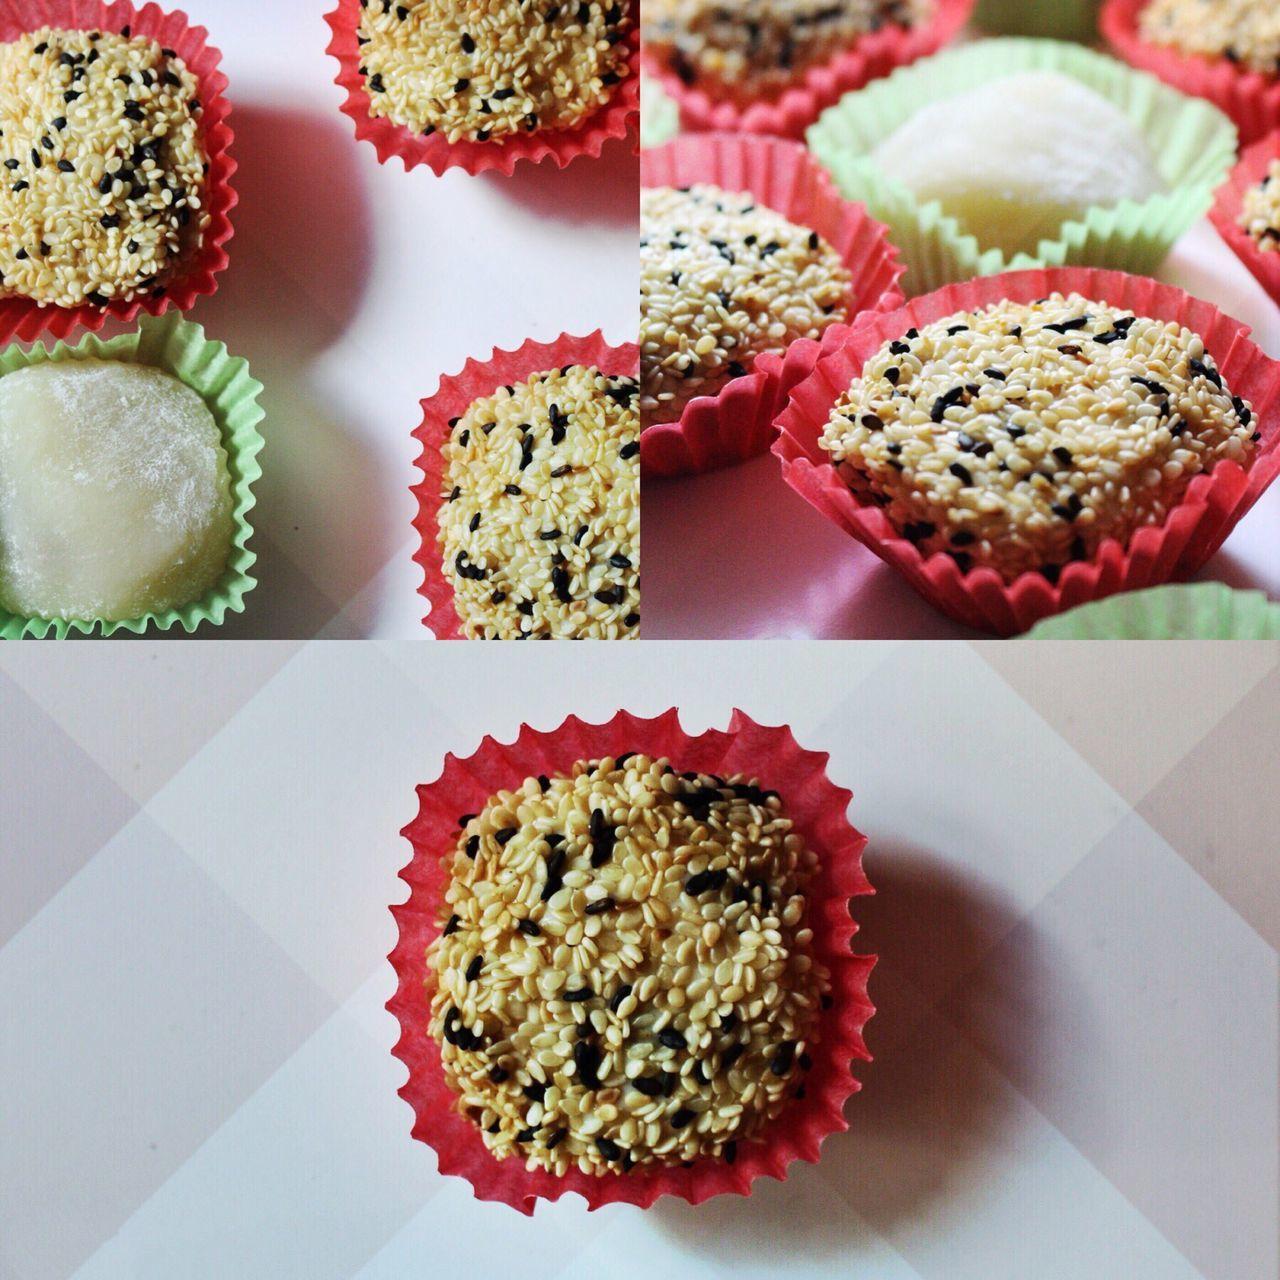 The beauty of Mochi Mochi Ricecake Japanese Food Japanese Dessert Foodie Dessert Japanese New Year